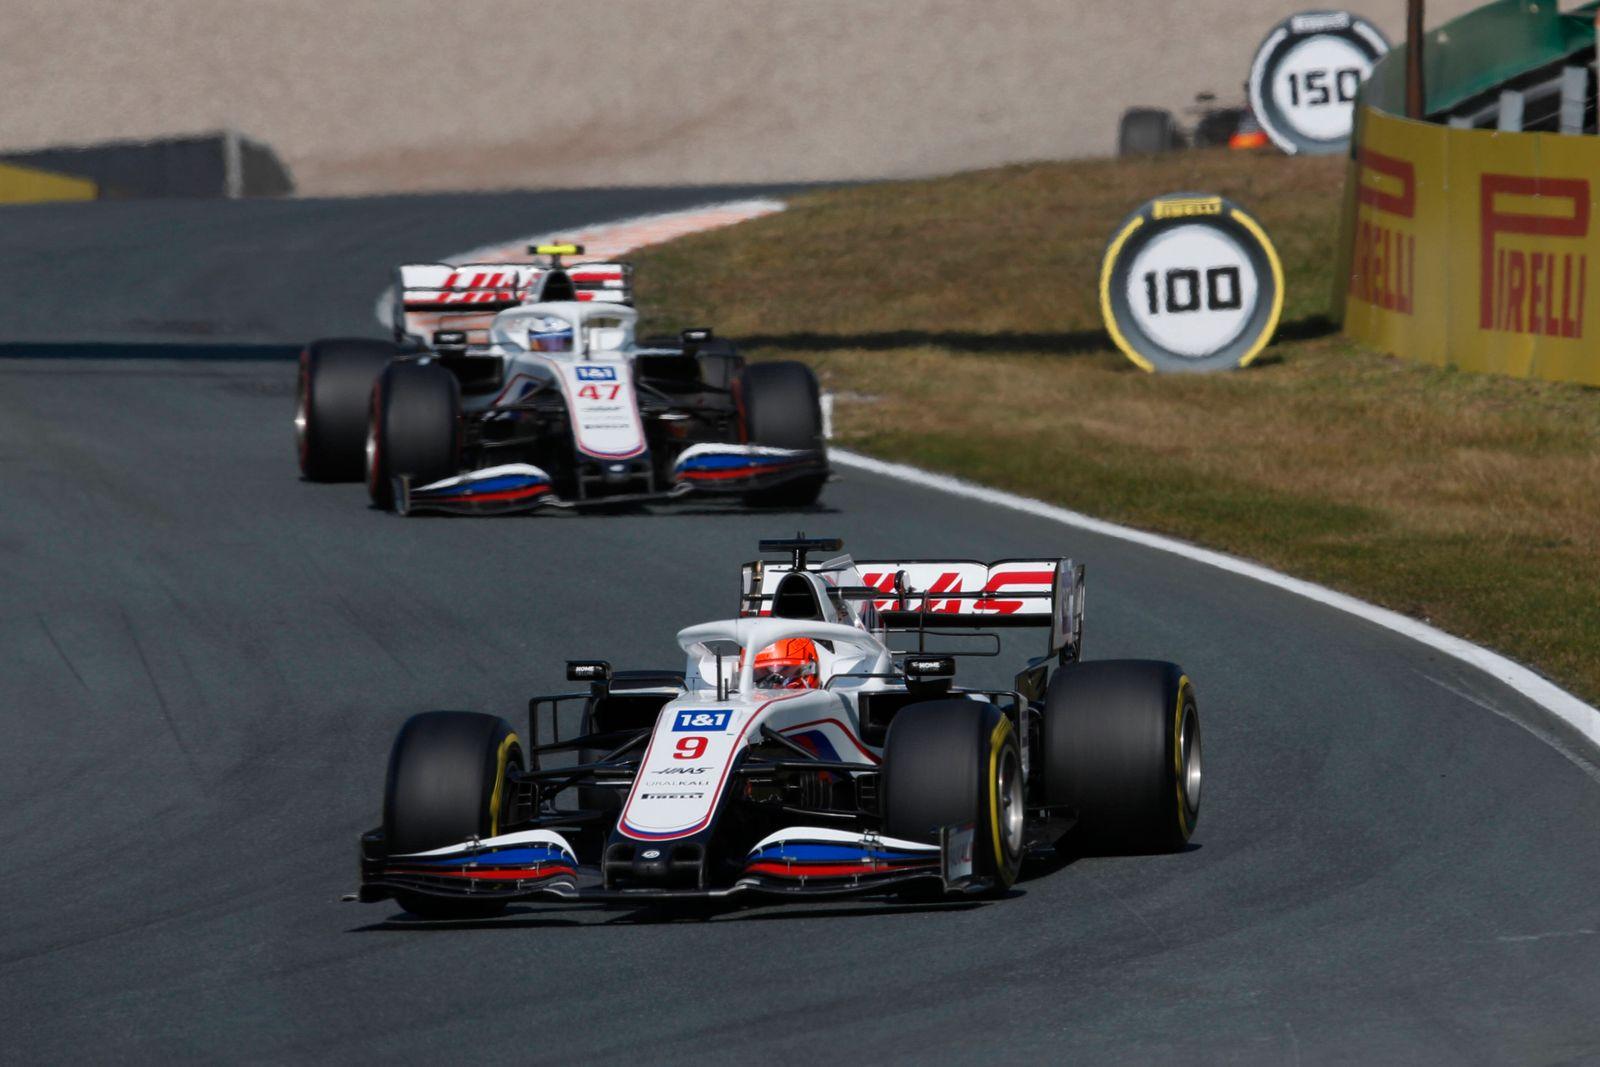 Formula 1 2021: Dutch GP CIRCUIT ZANDVOORT, NETHERLANDS - SEPTEMBER 05: Nikita Mazepin, Haas VF-21, leads Mick Schumach